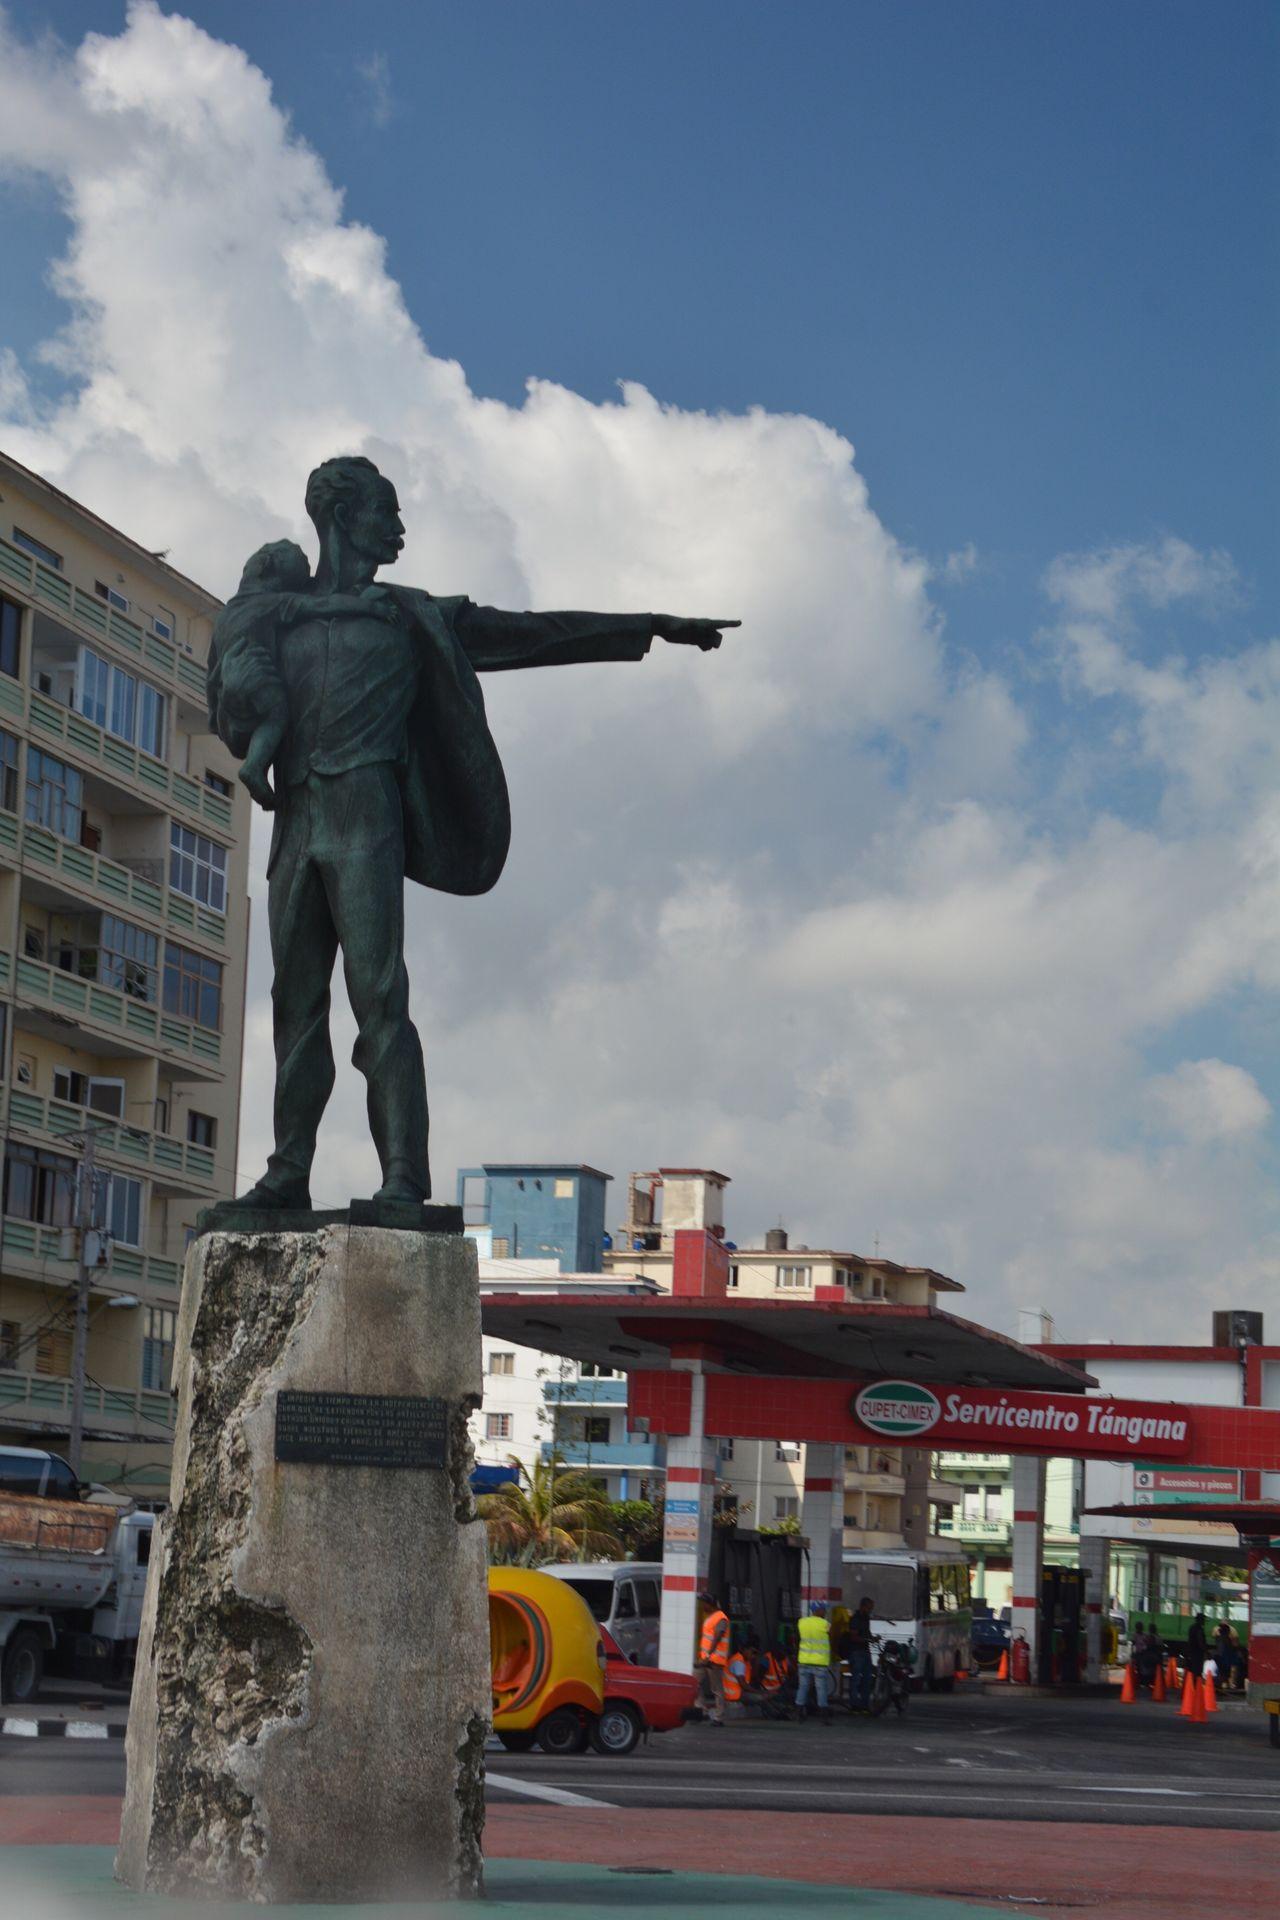 Jose Marti holding Elian Gonzalez statue across from US Embassy in Havana, Cuba. Jose Marti  Elian Gonzalez Cuba UsembassyCuba US Embassy Cuba Anti-Imperialist Plaza Havana Habana Habana Cuba  Havana Cuba Feelthejourney Feel The Journey